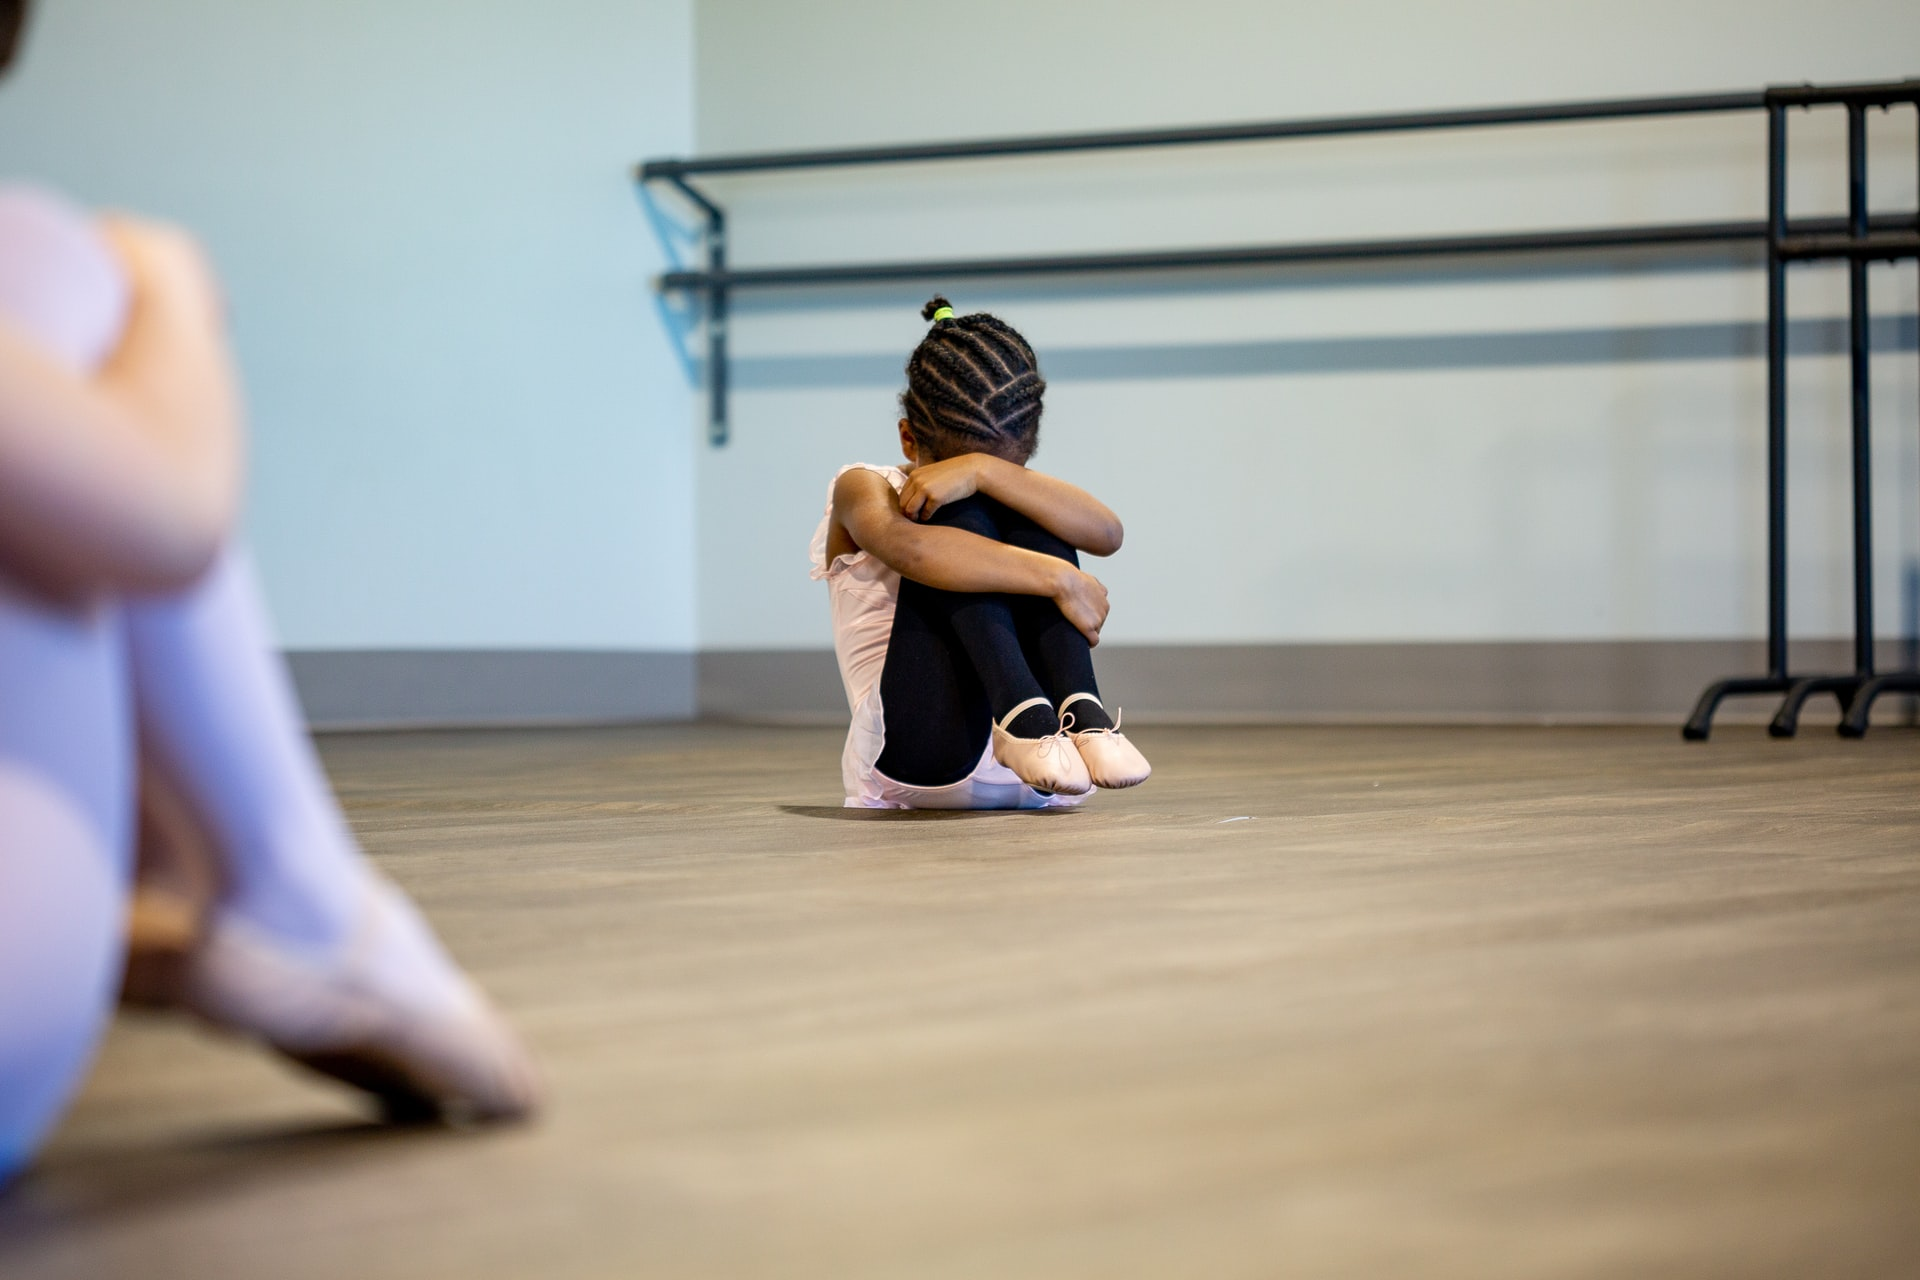 Childhood Fears and Phobias